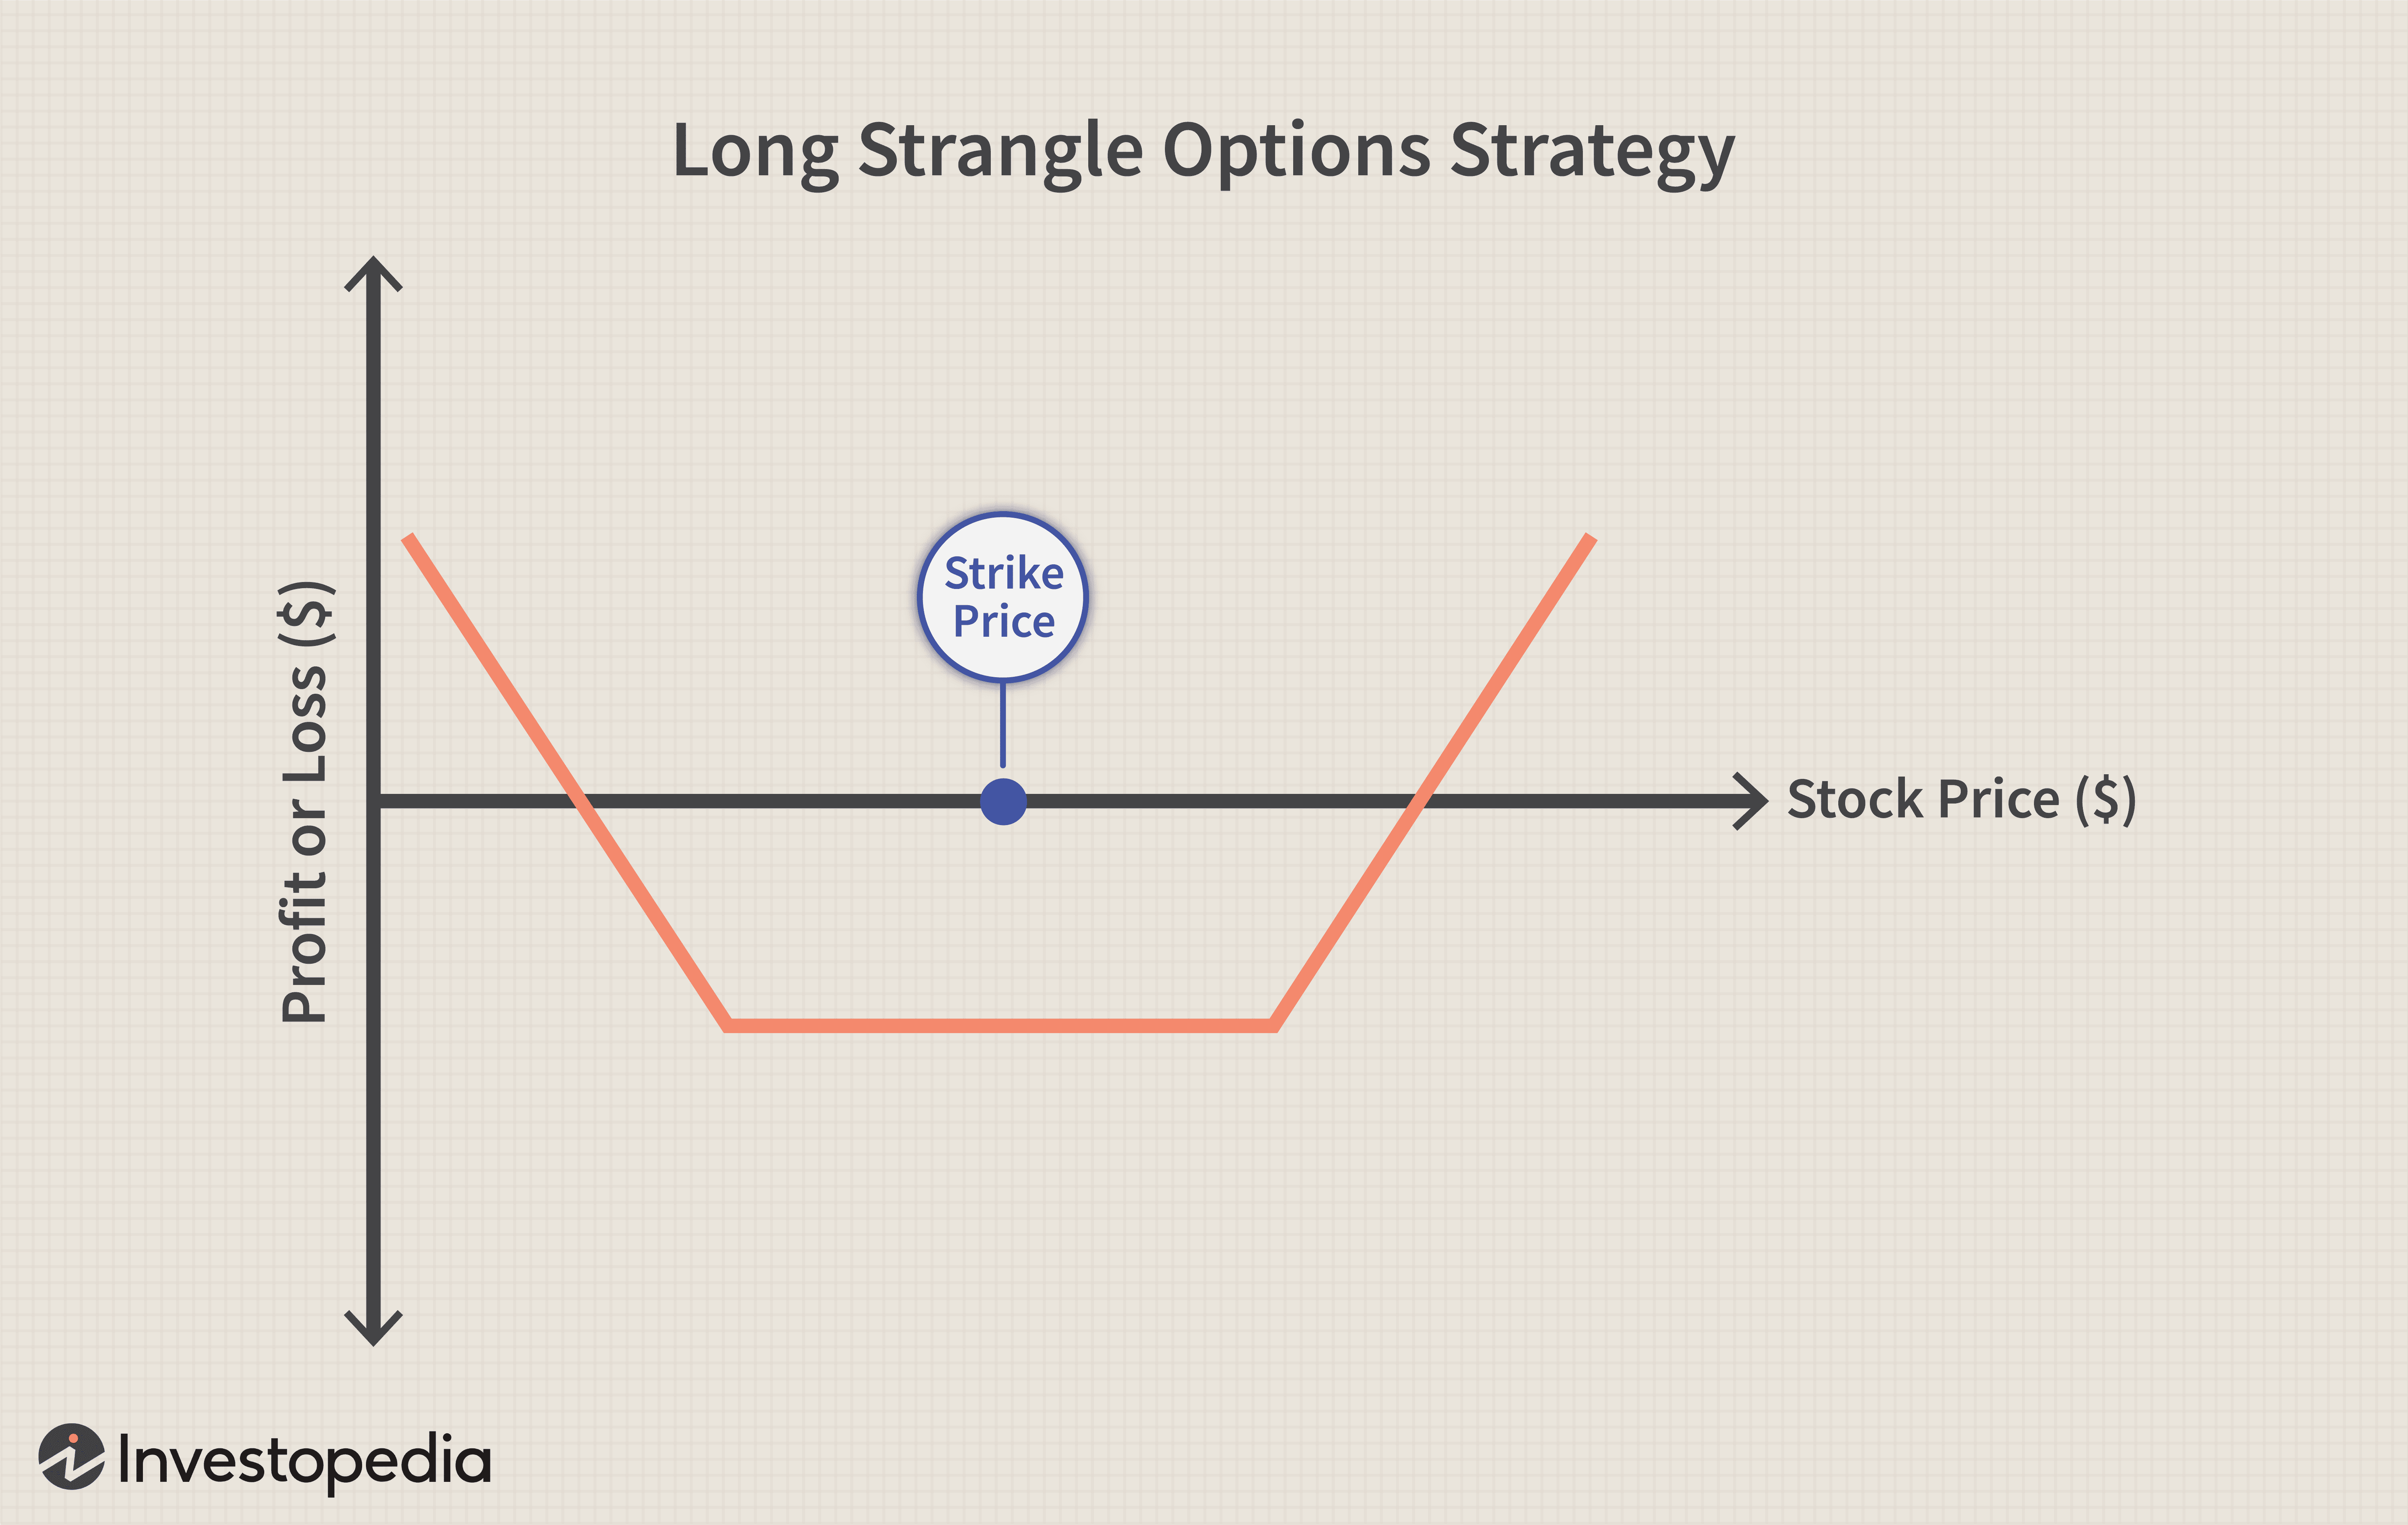 Long Strangle Options Strategy